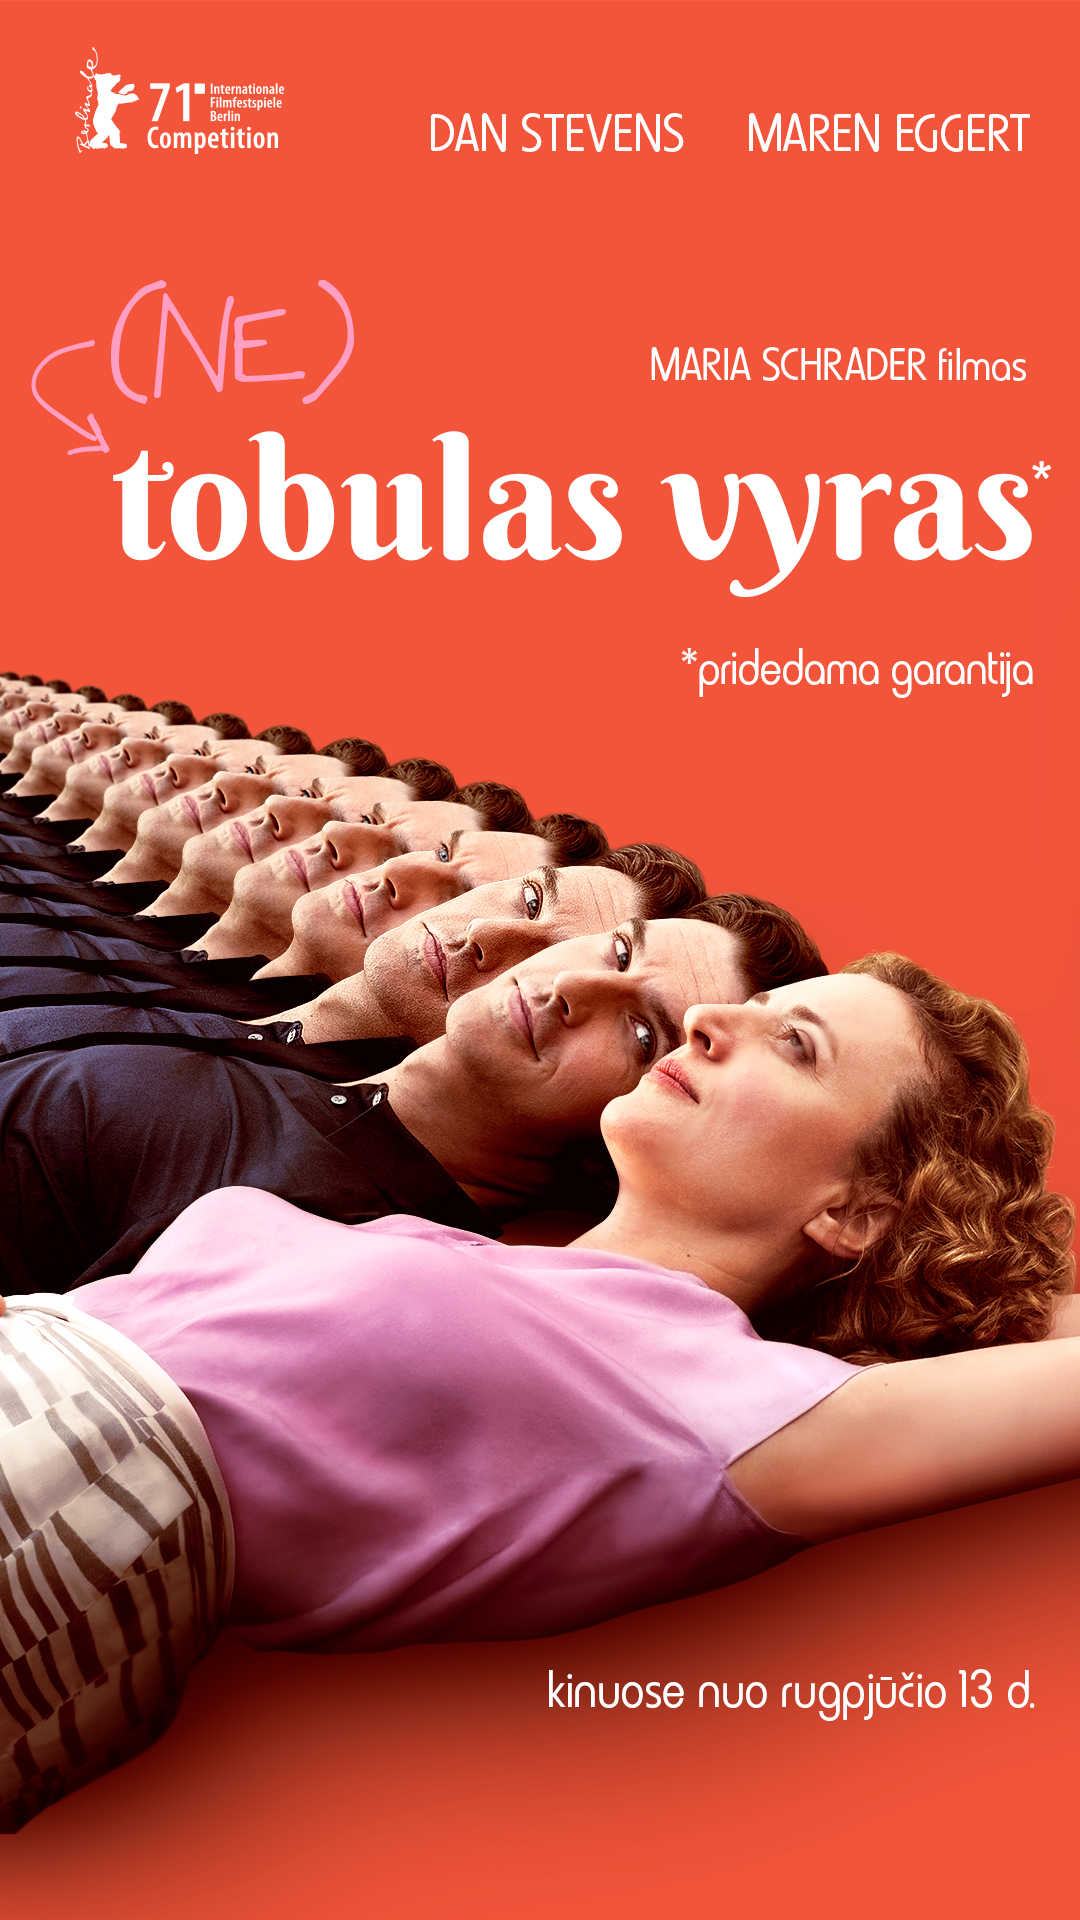 (NE)TOBULAS VYRAS (I'm Your Man)